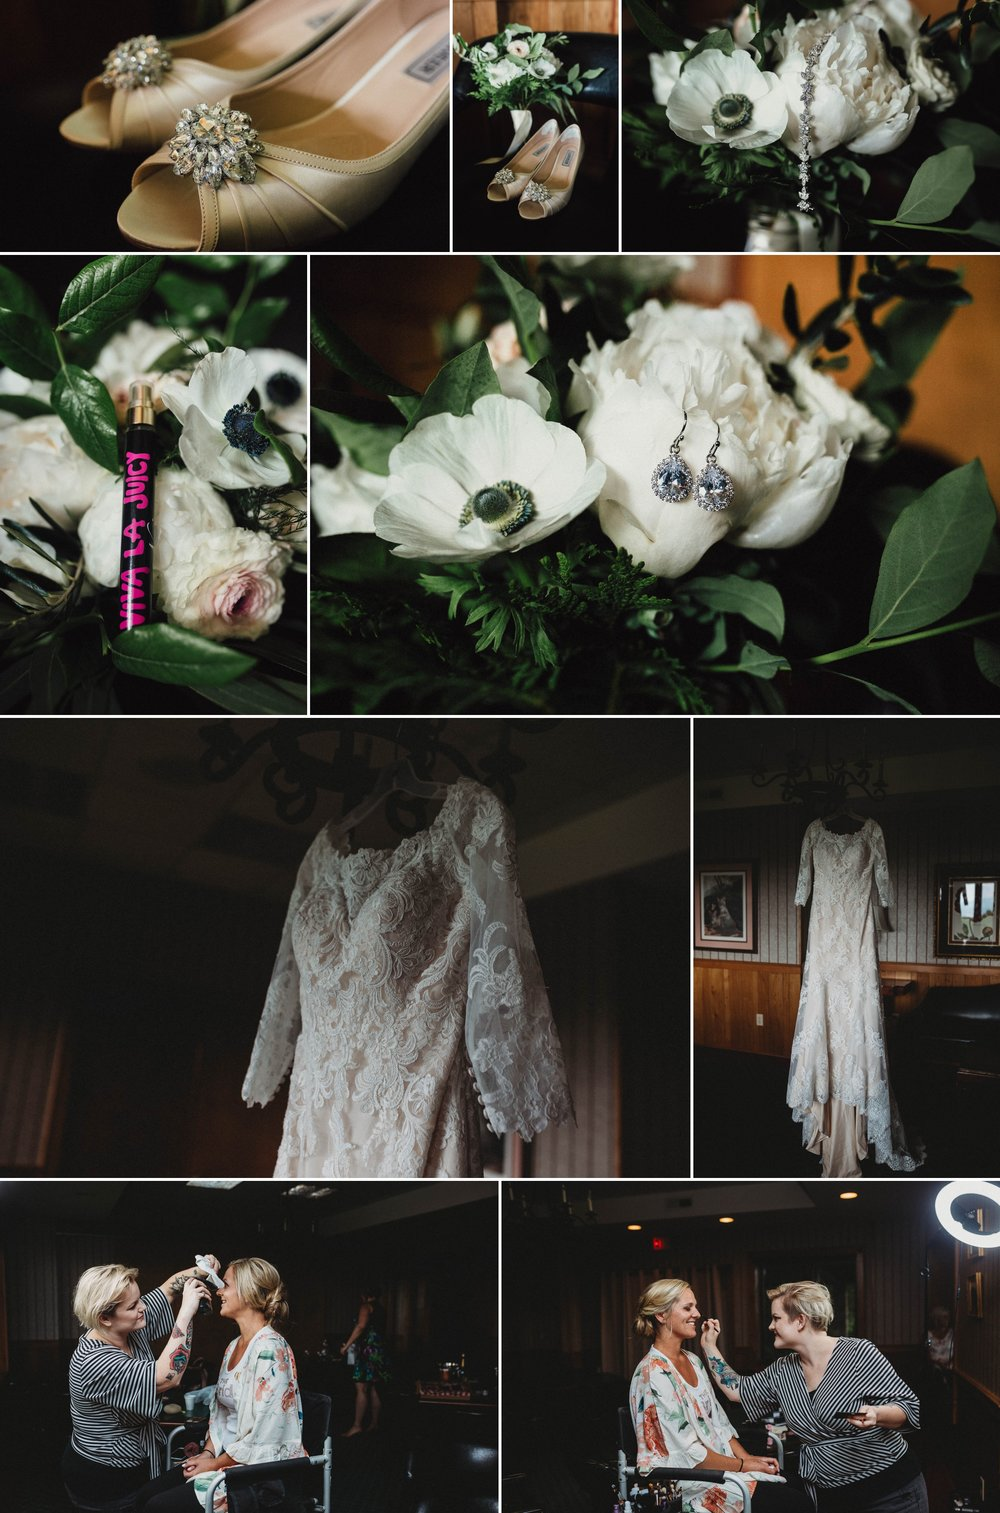 Bridal Details, Bouquet and Wedding Dress, Glitter Shoes, Beech Mountain Club Wedding - Asheville North Carolina Photographer